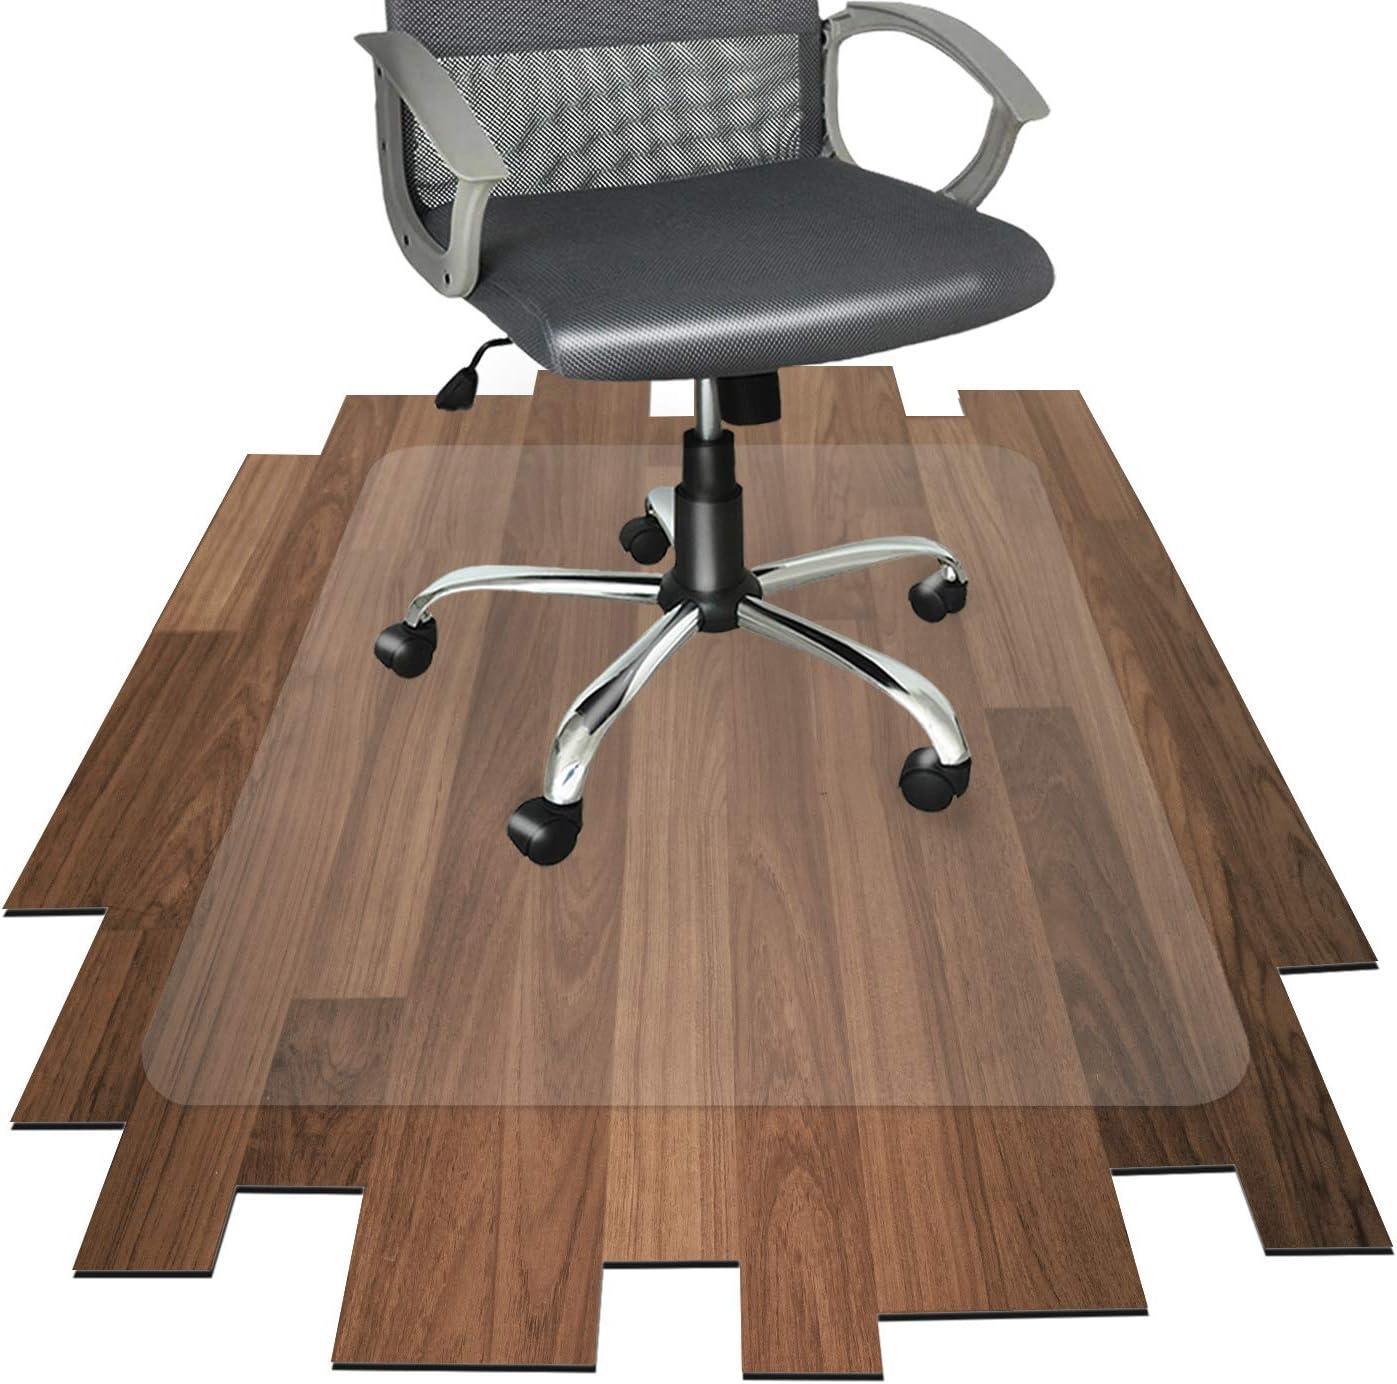 Non-Slip Durable Hard-Floor Protector Mat with 4mm 55x35Office Chair Mat UK STOCK 100/% Polyester Fiber Floor Protector Mat for Office//Home